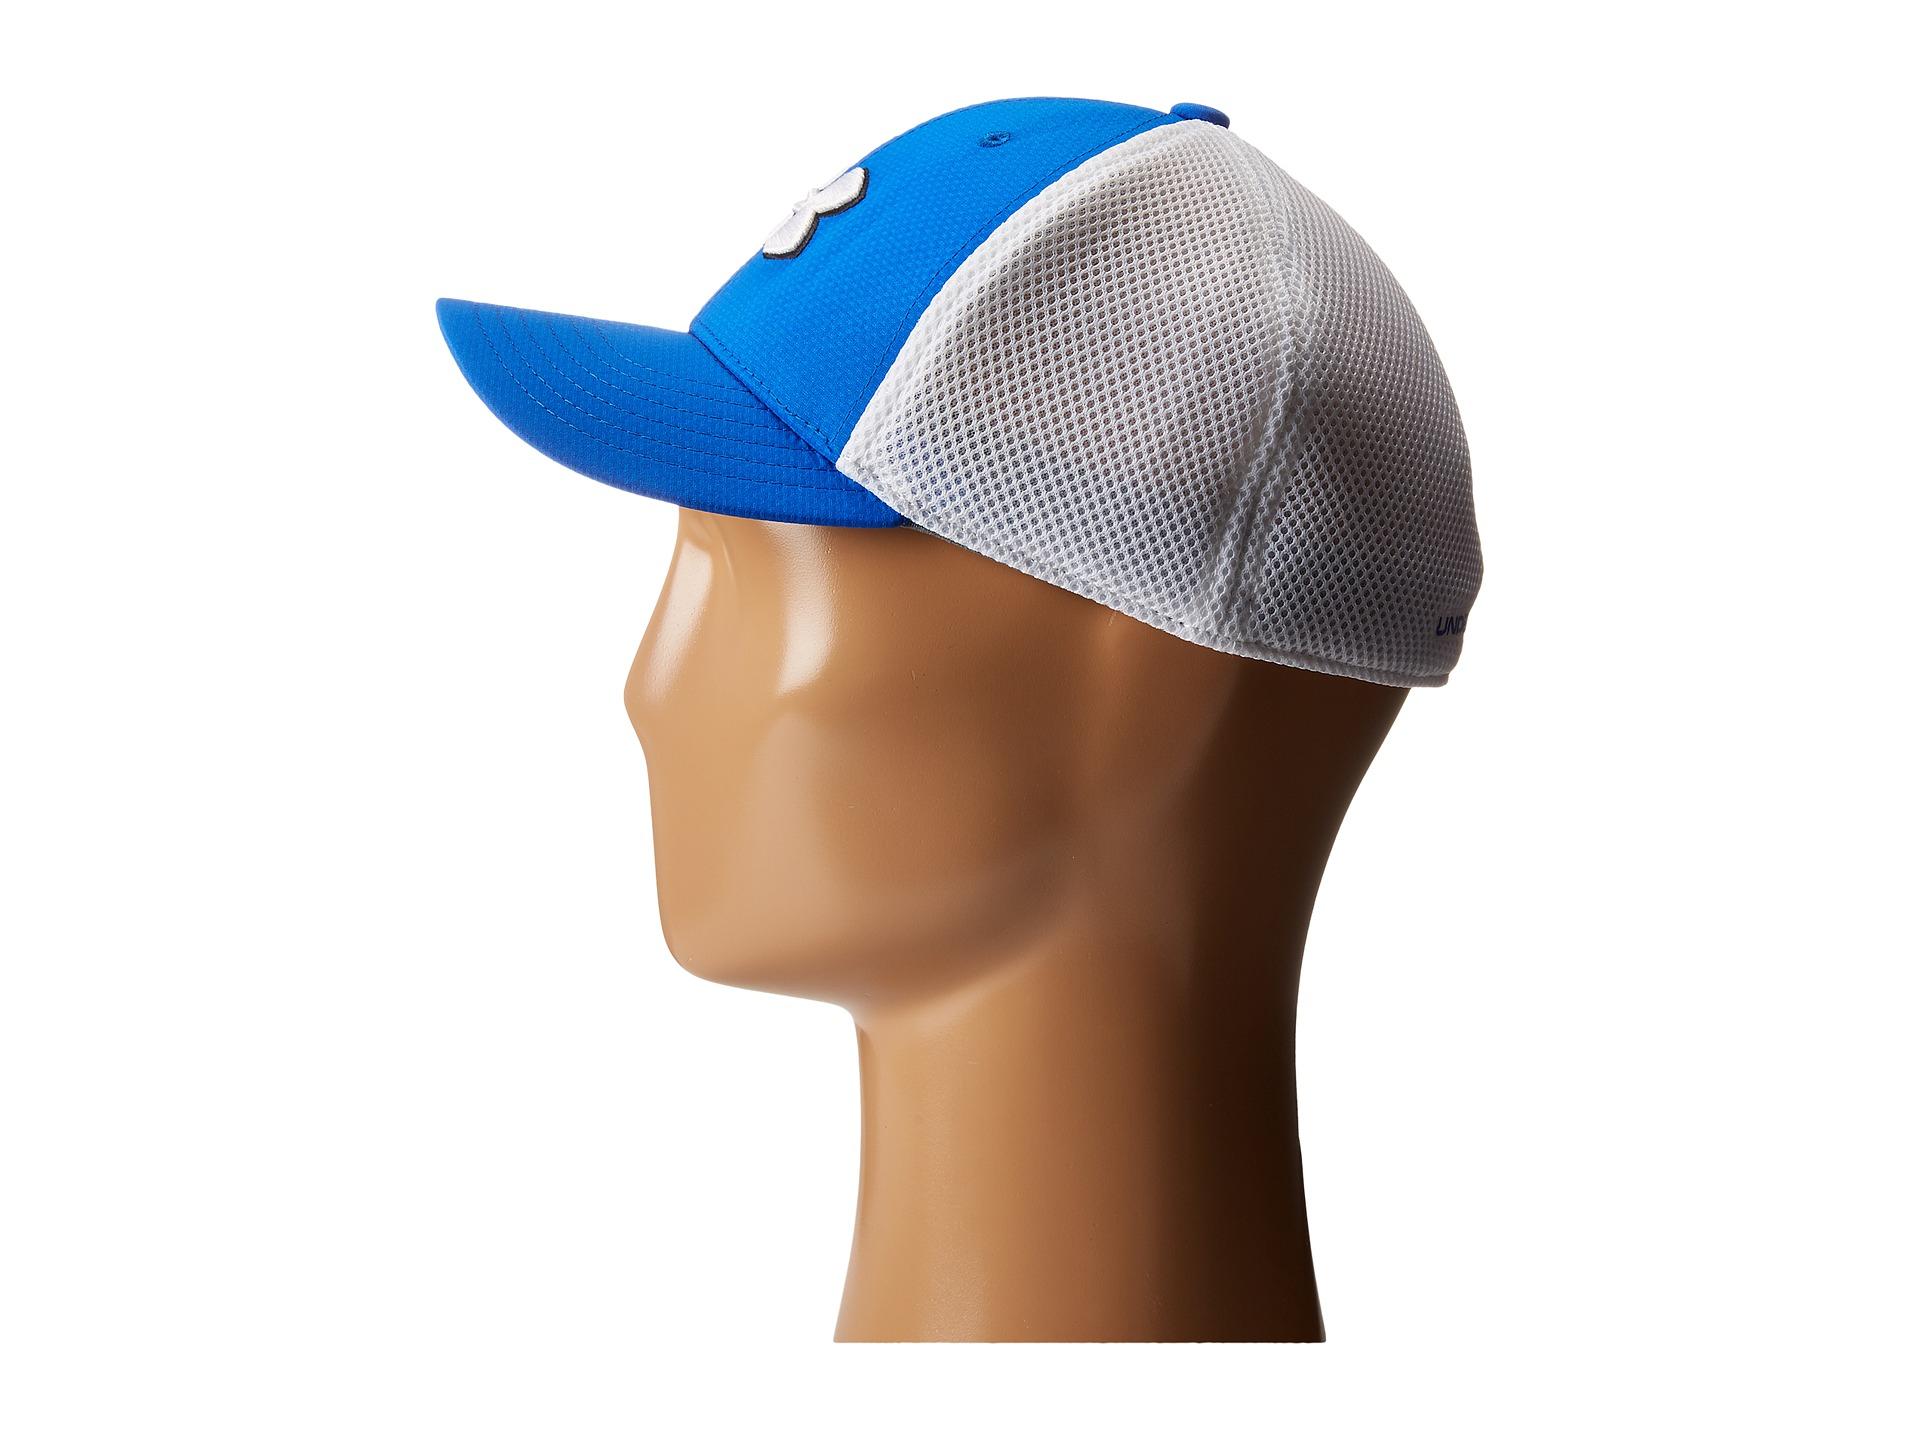 e7870280e23 ... new style lyst under armour ua golf classic mesh cap youth in blue for  men 19da8